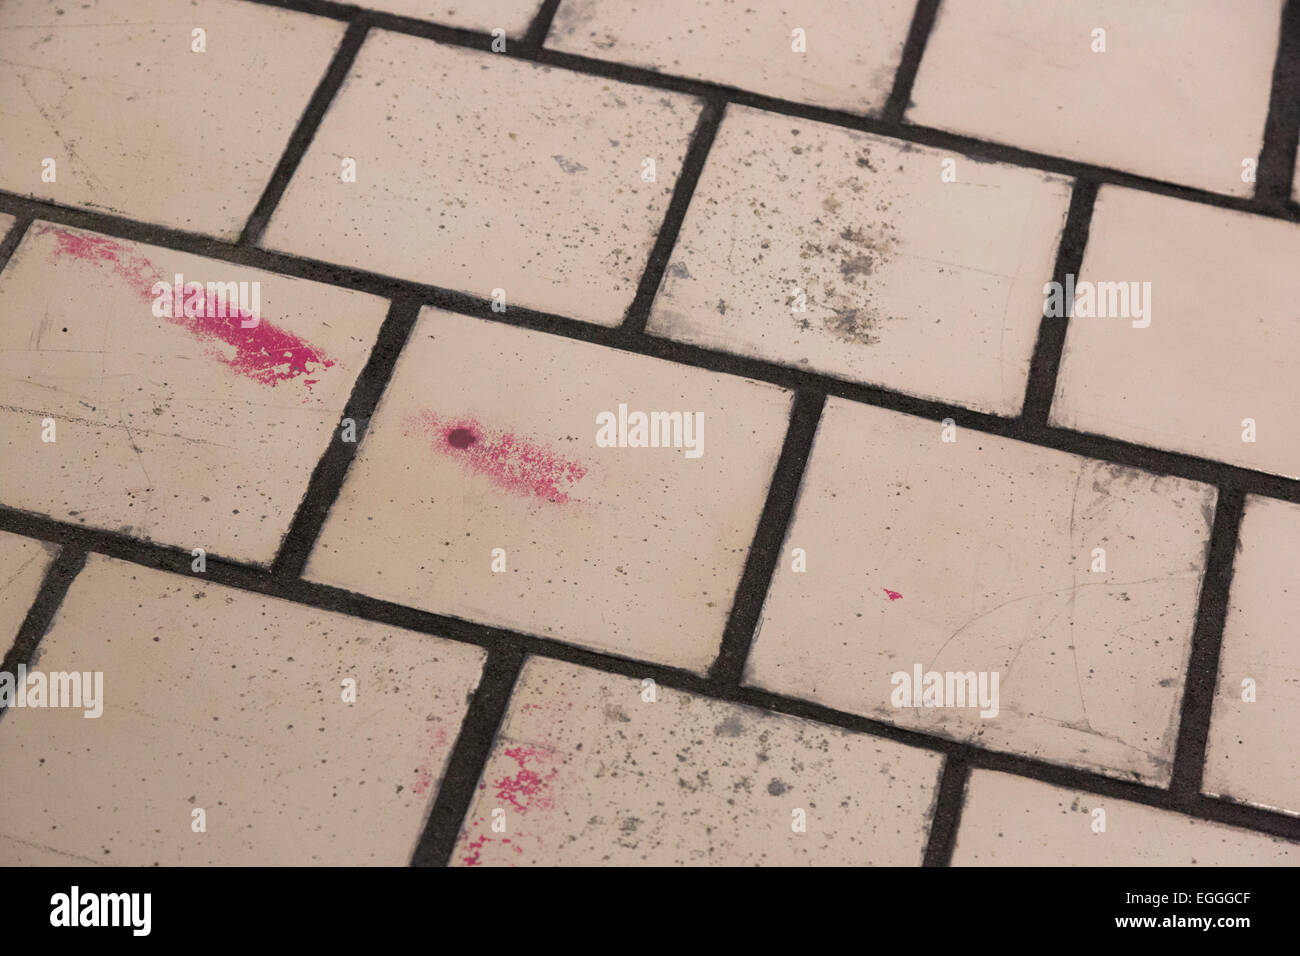 London, UK. 24 February 2015. 105 ceramic tiles and concrete floor ...